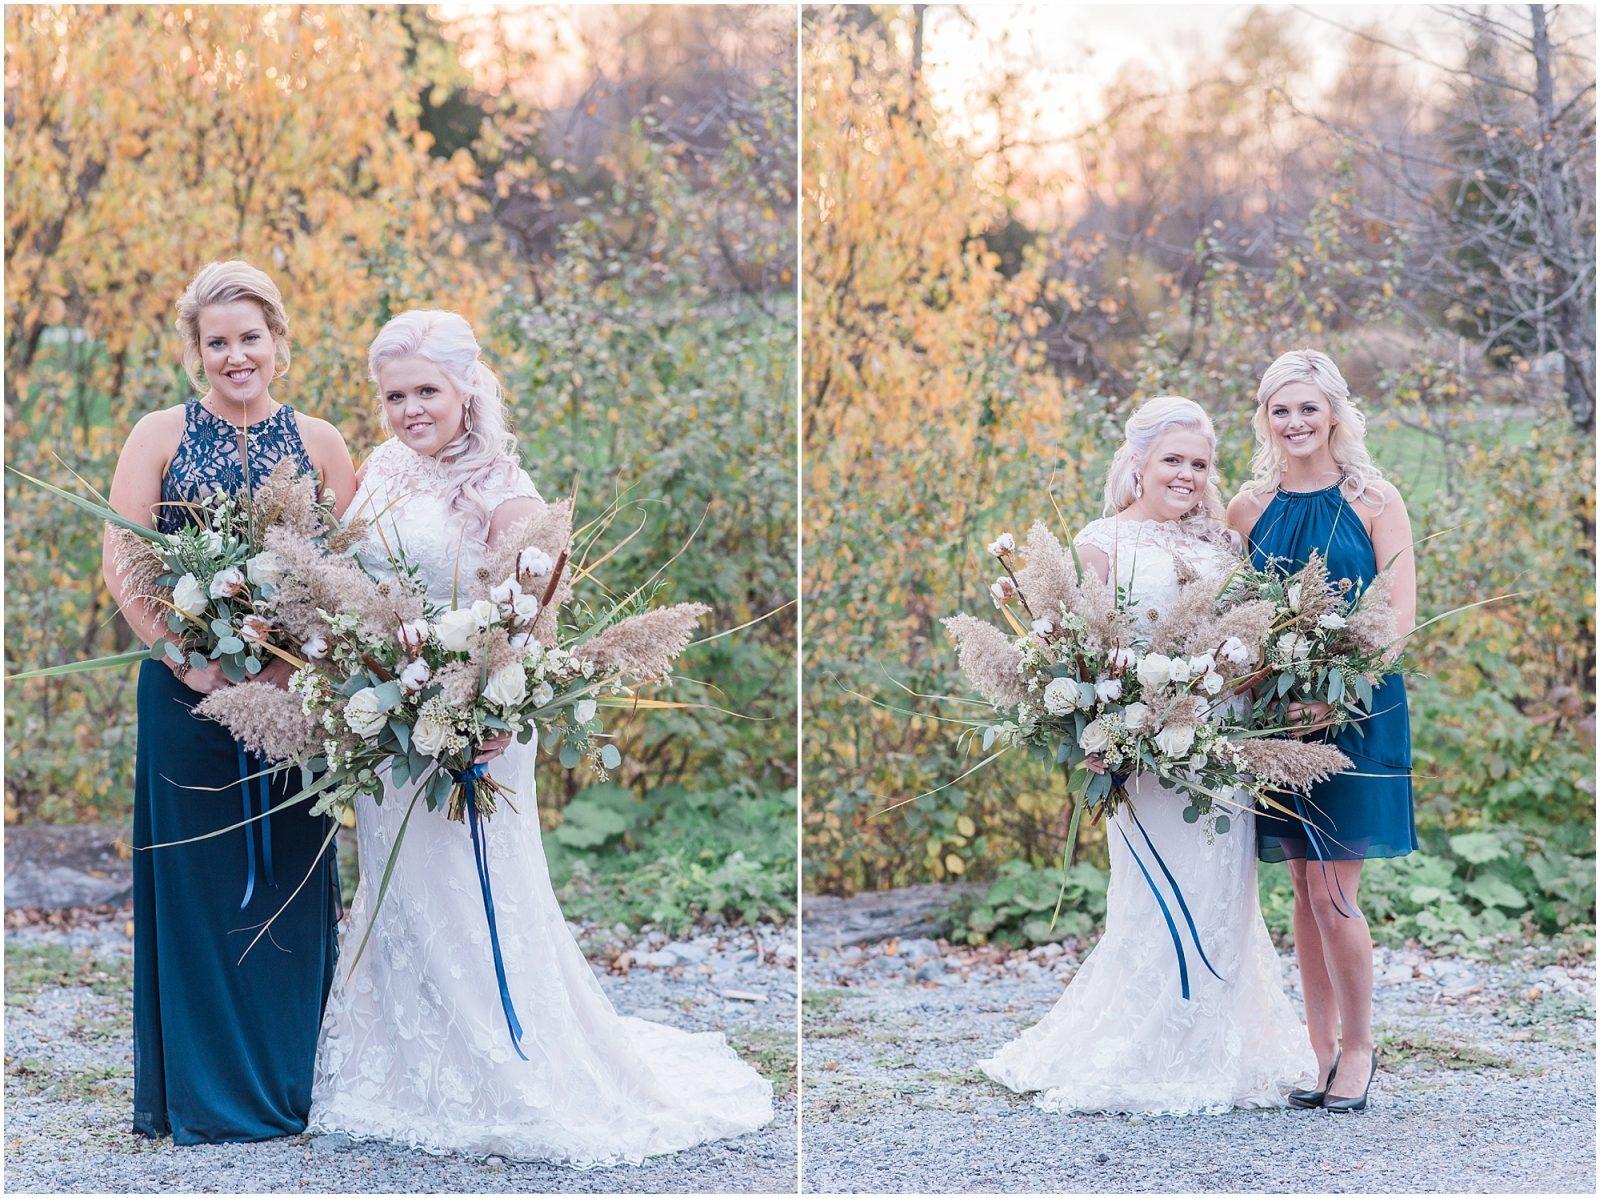 0059 Bethany and Luc - Fall Backyard Ottawa Wedding - Copper and Navy - PhotosbyEmmaH.jpg